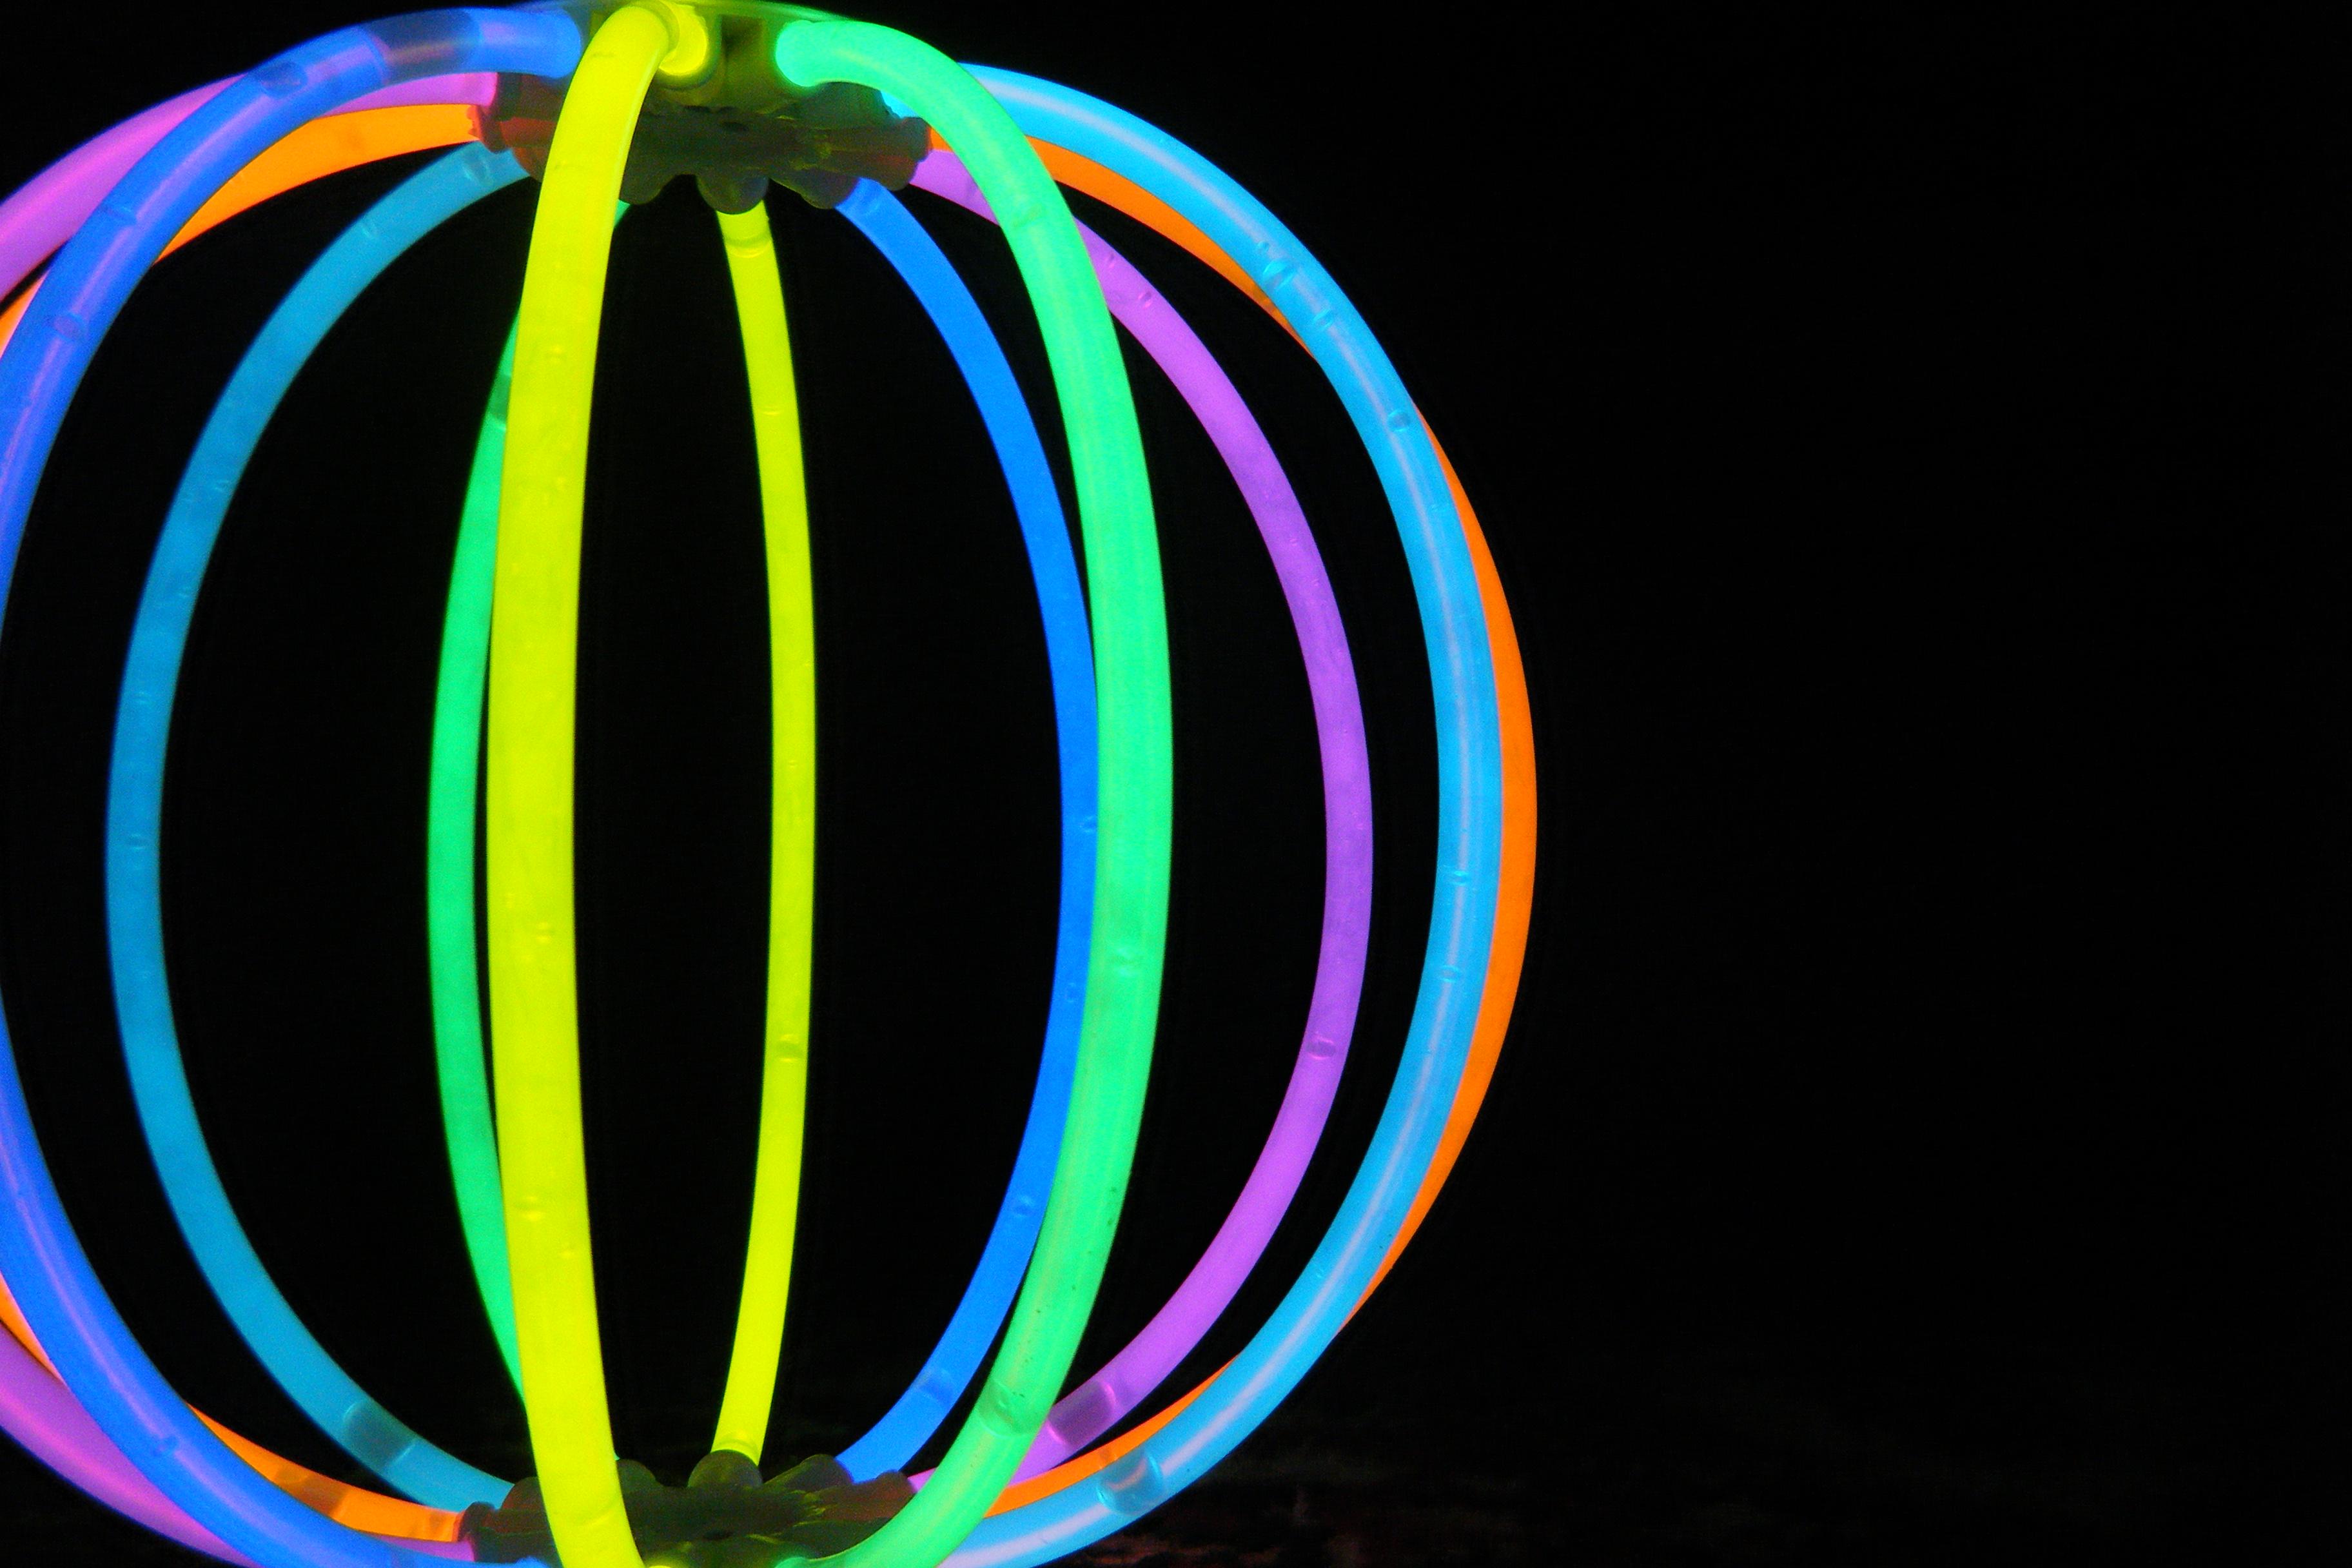 Things That Glow in the Dark